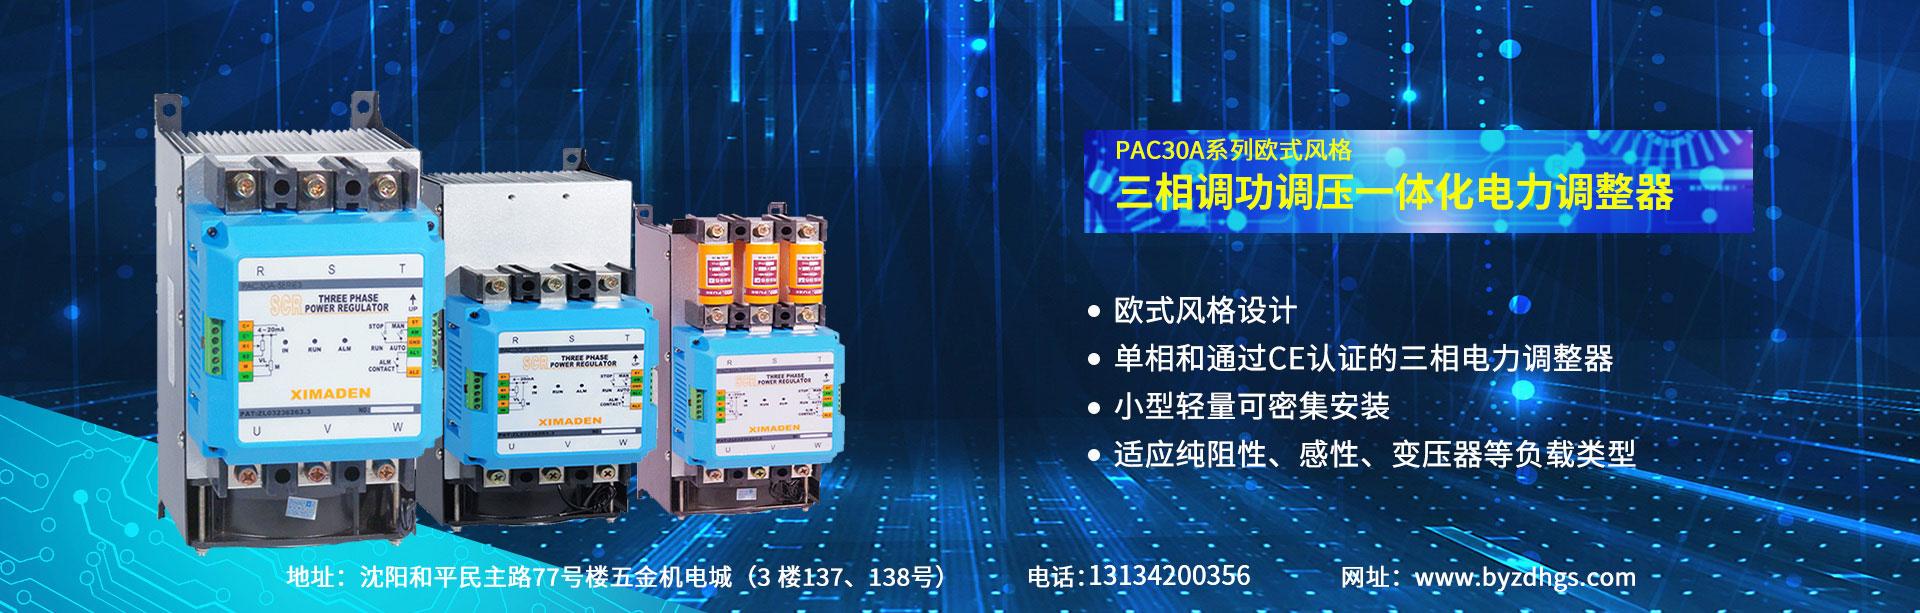 http://www.byzdhgs.com/product-1048.html